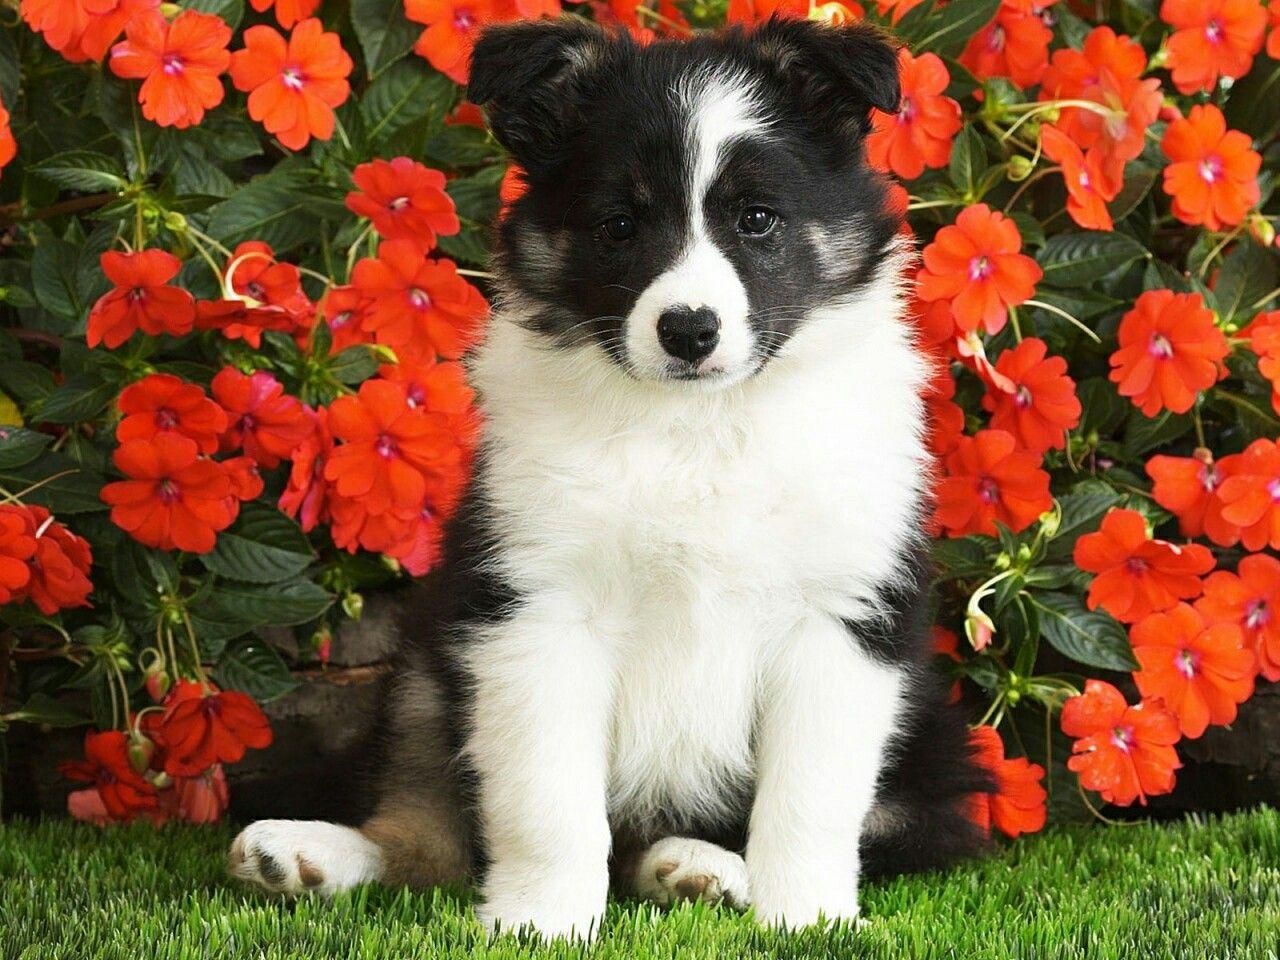 Pin by m tiebosch on honden pinterest